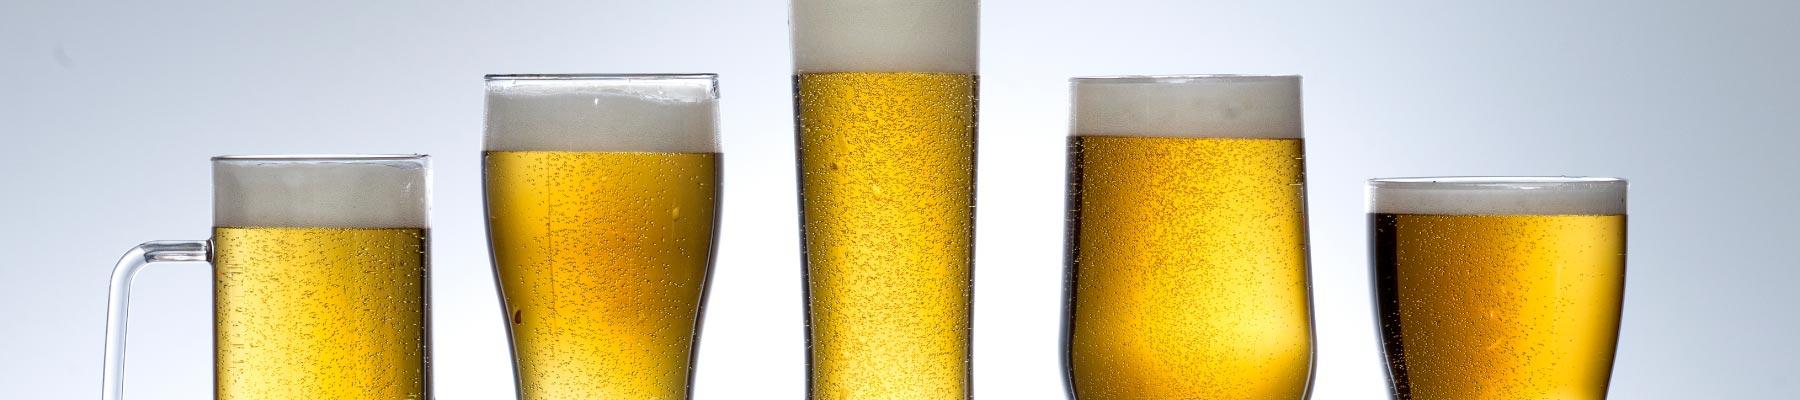 Reusable Pint Glasses Southampton